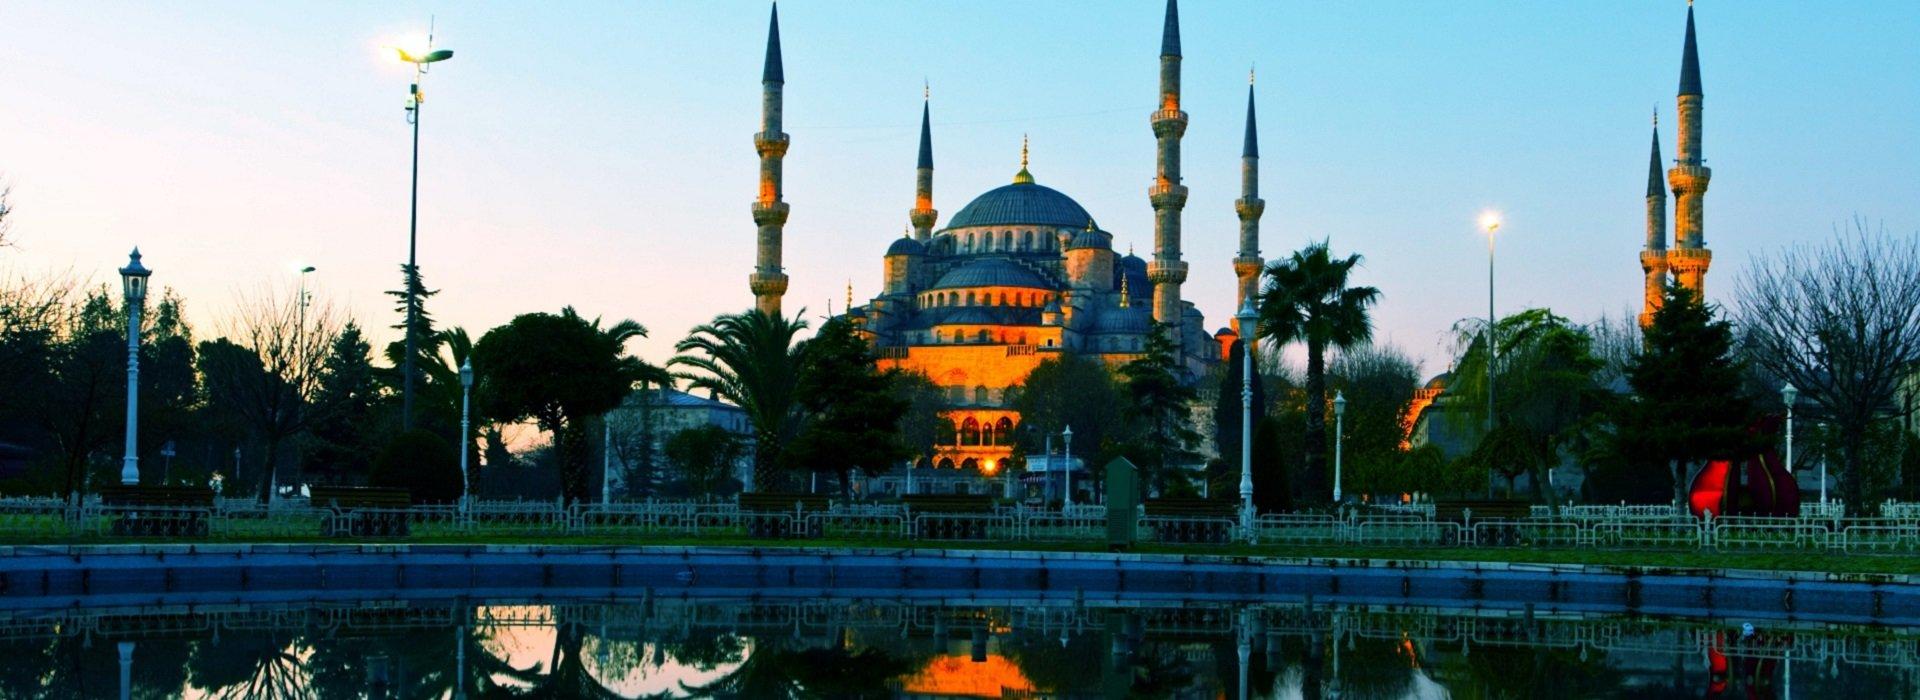 istanbul_night